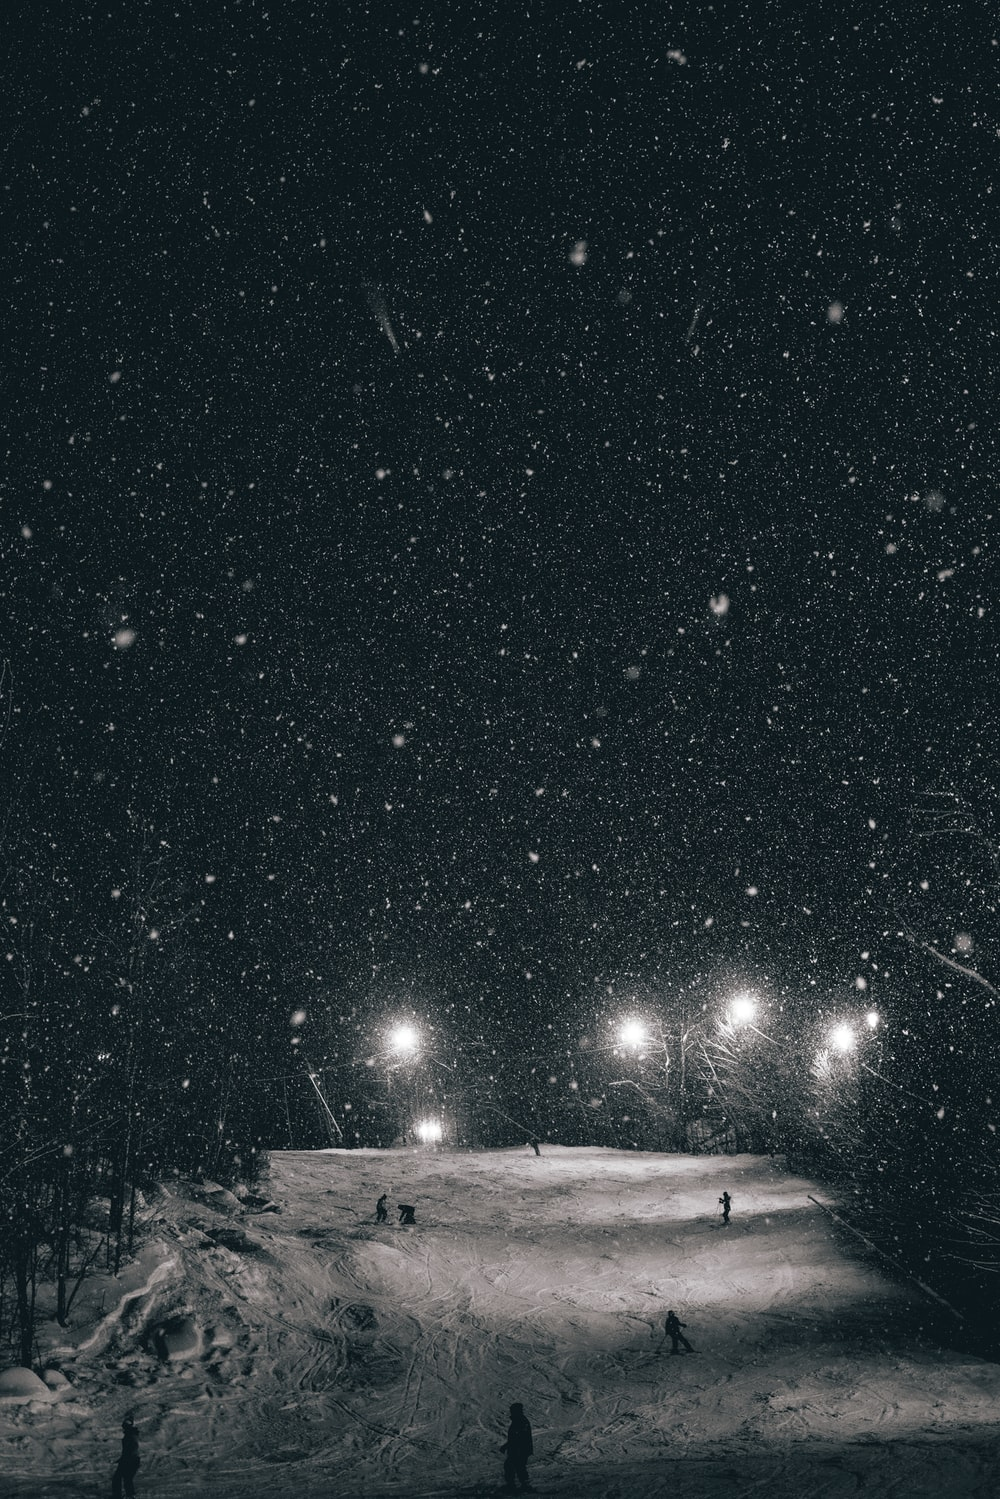 starry sky over tundra and lights